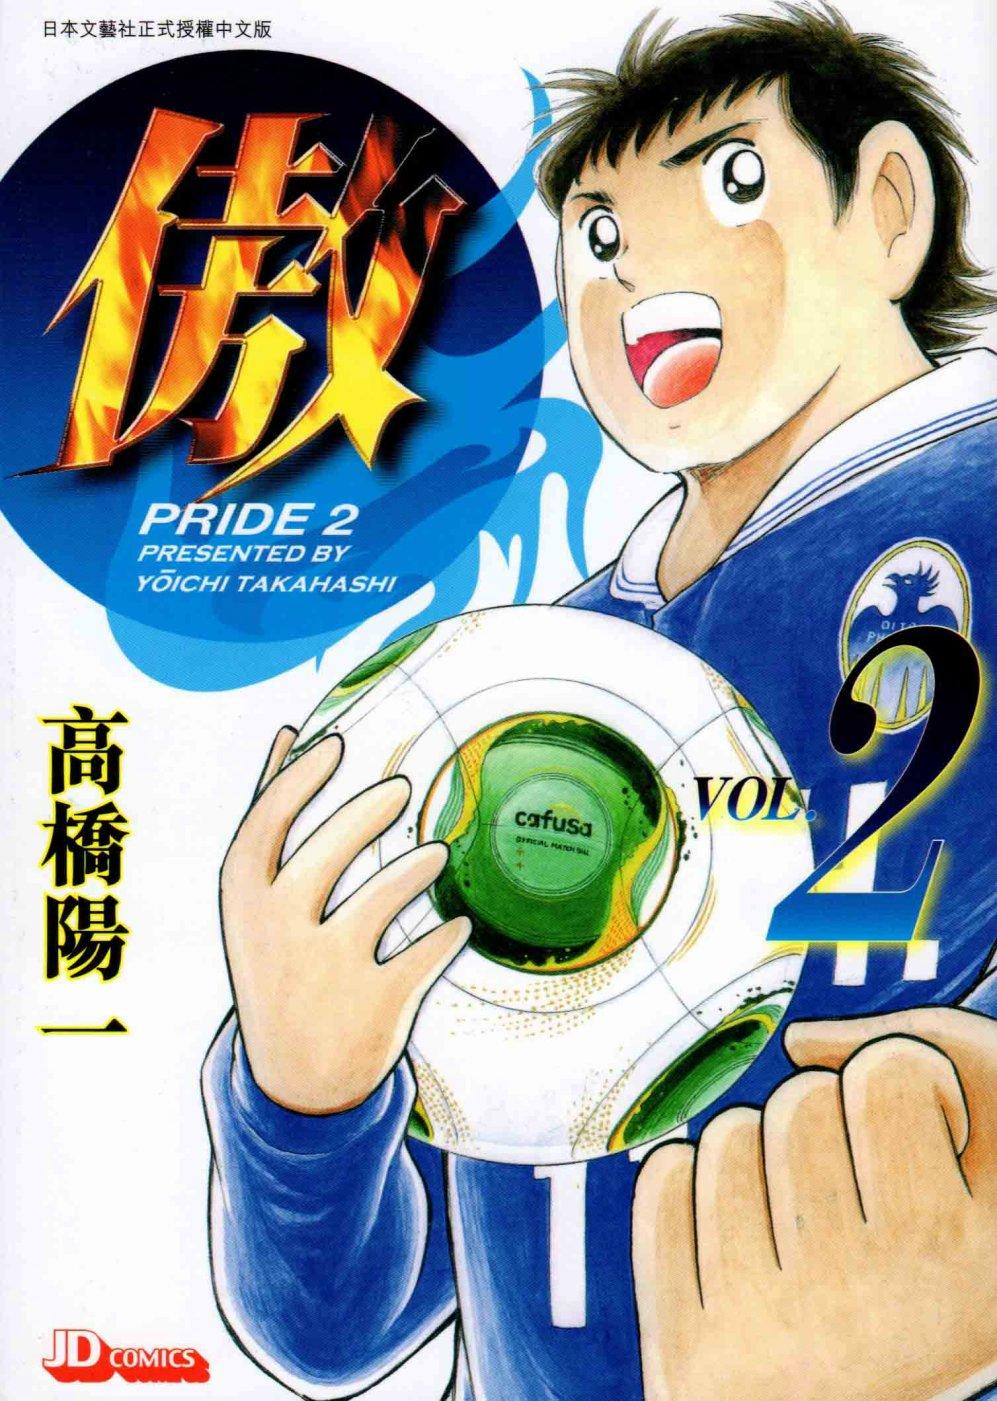 傲-PRIDE第2集